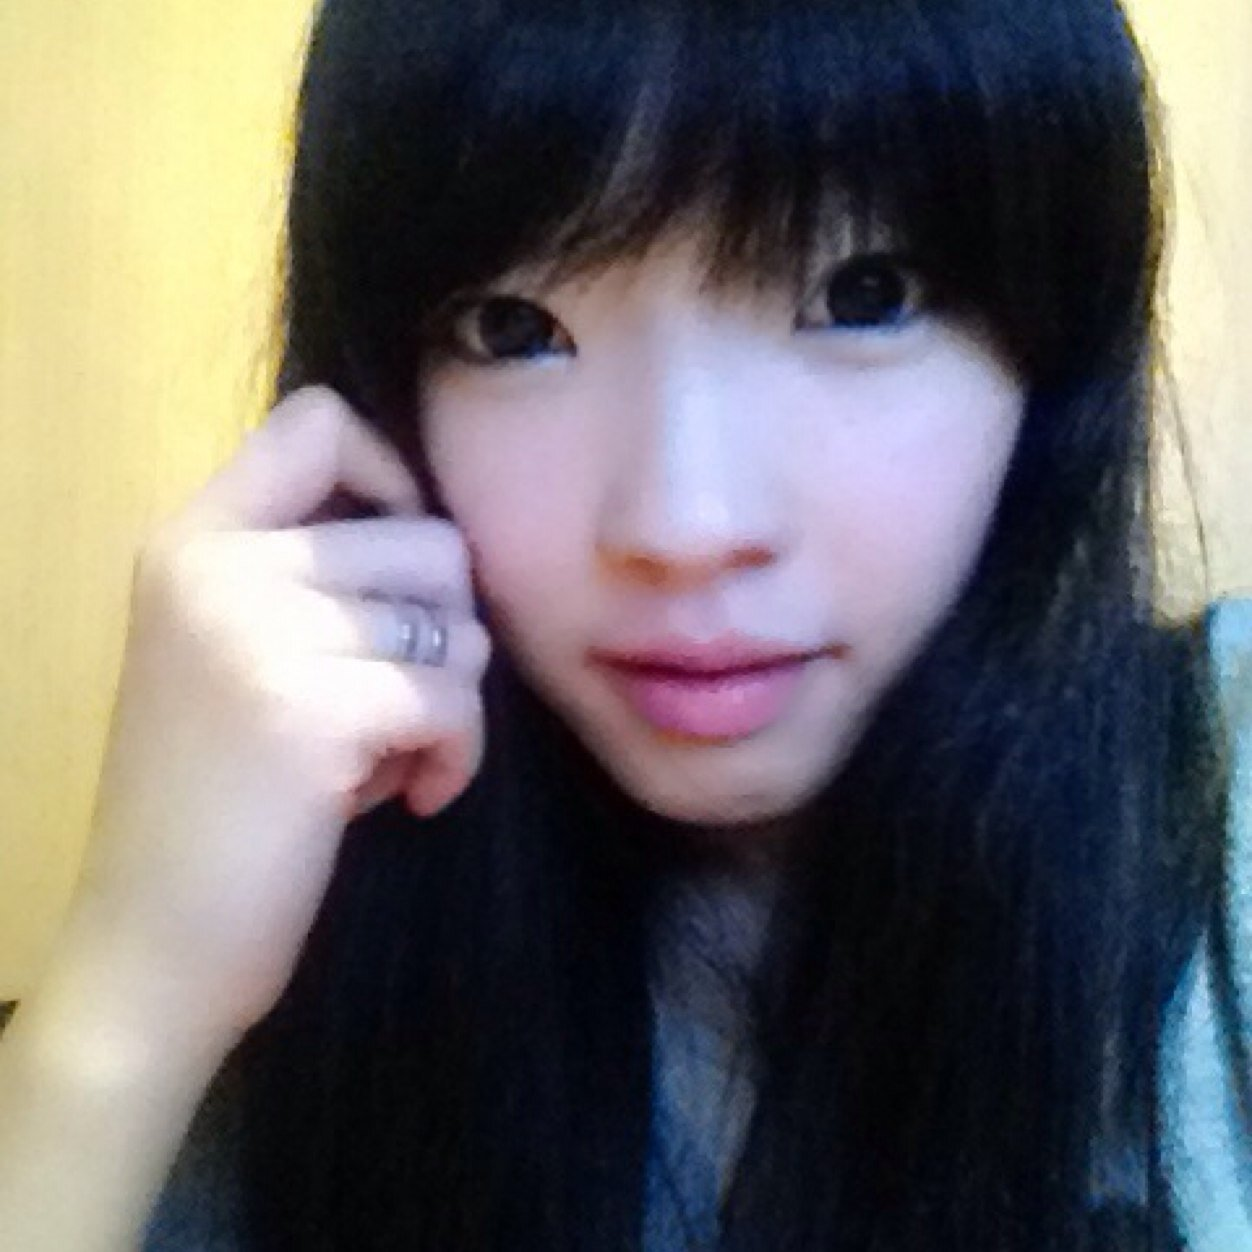 Albee Huang nude (96 photo), Sexy, Cleavage, Selfie, bra 2020